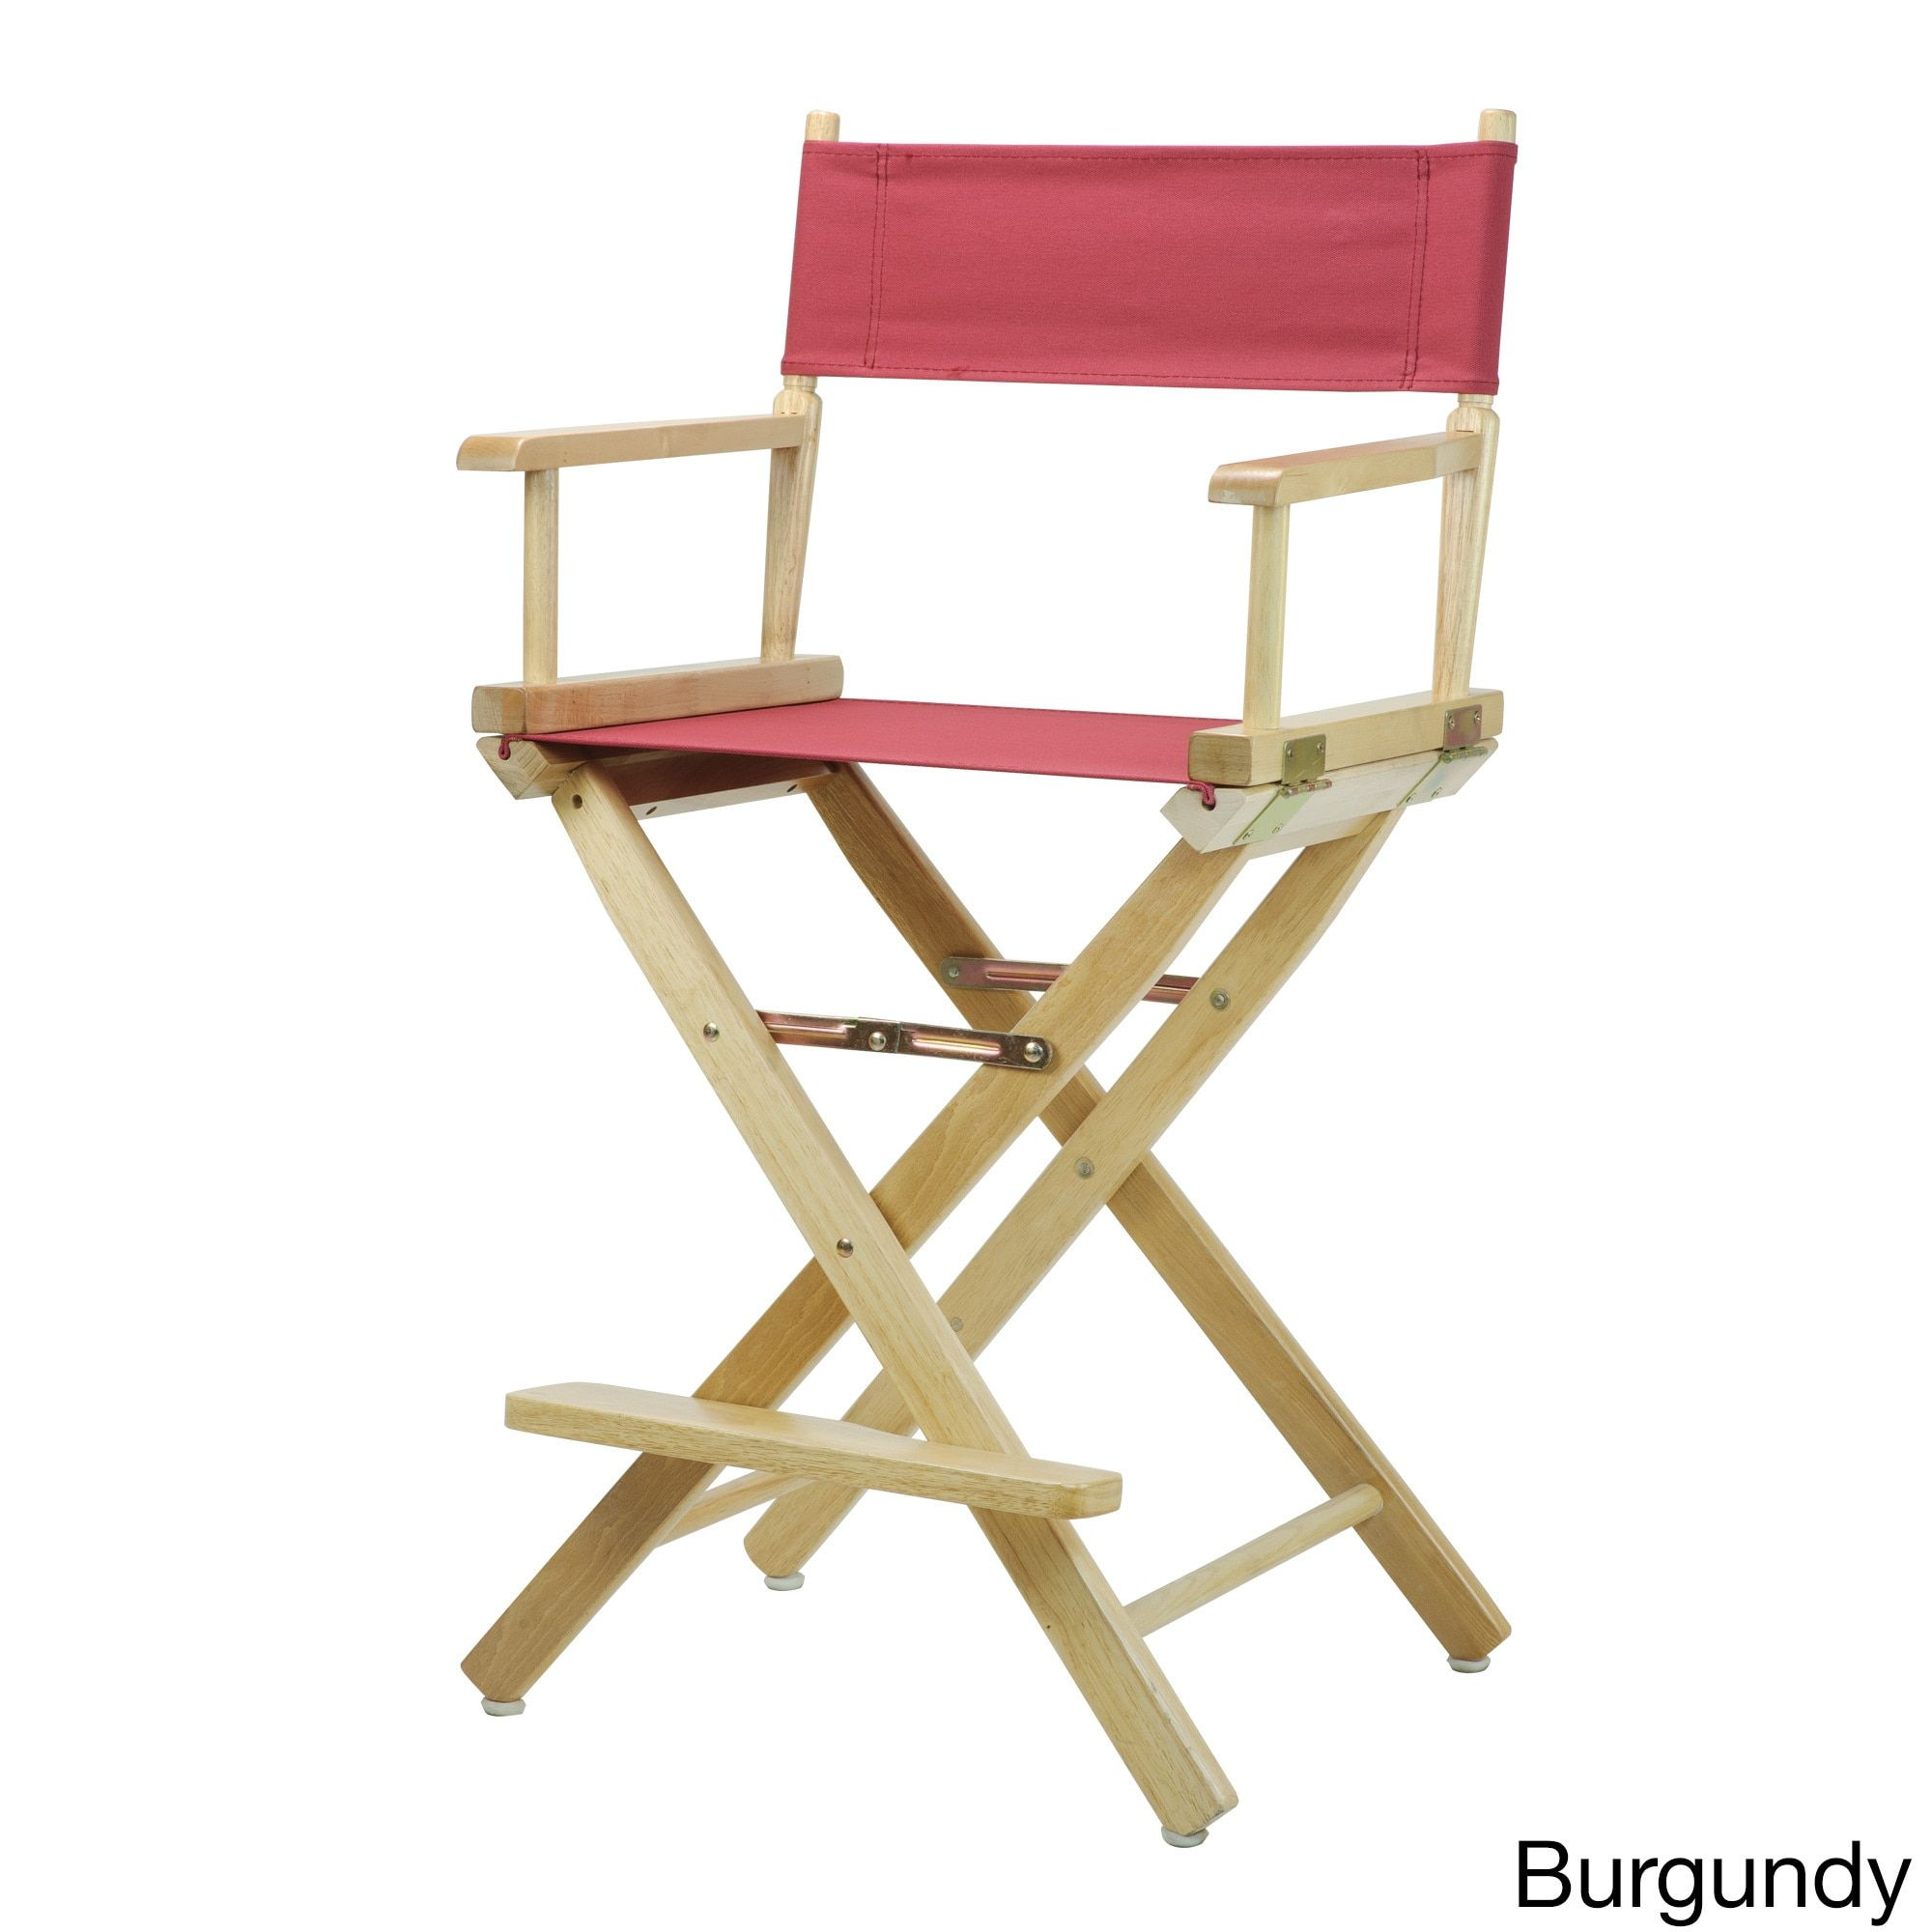 Pin On Chairs Tables Cadeiras Mesas Outros